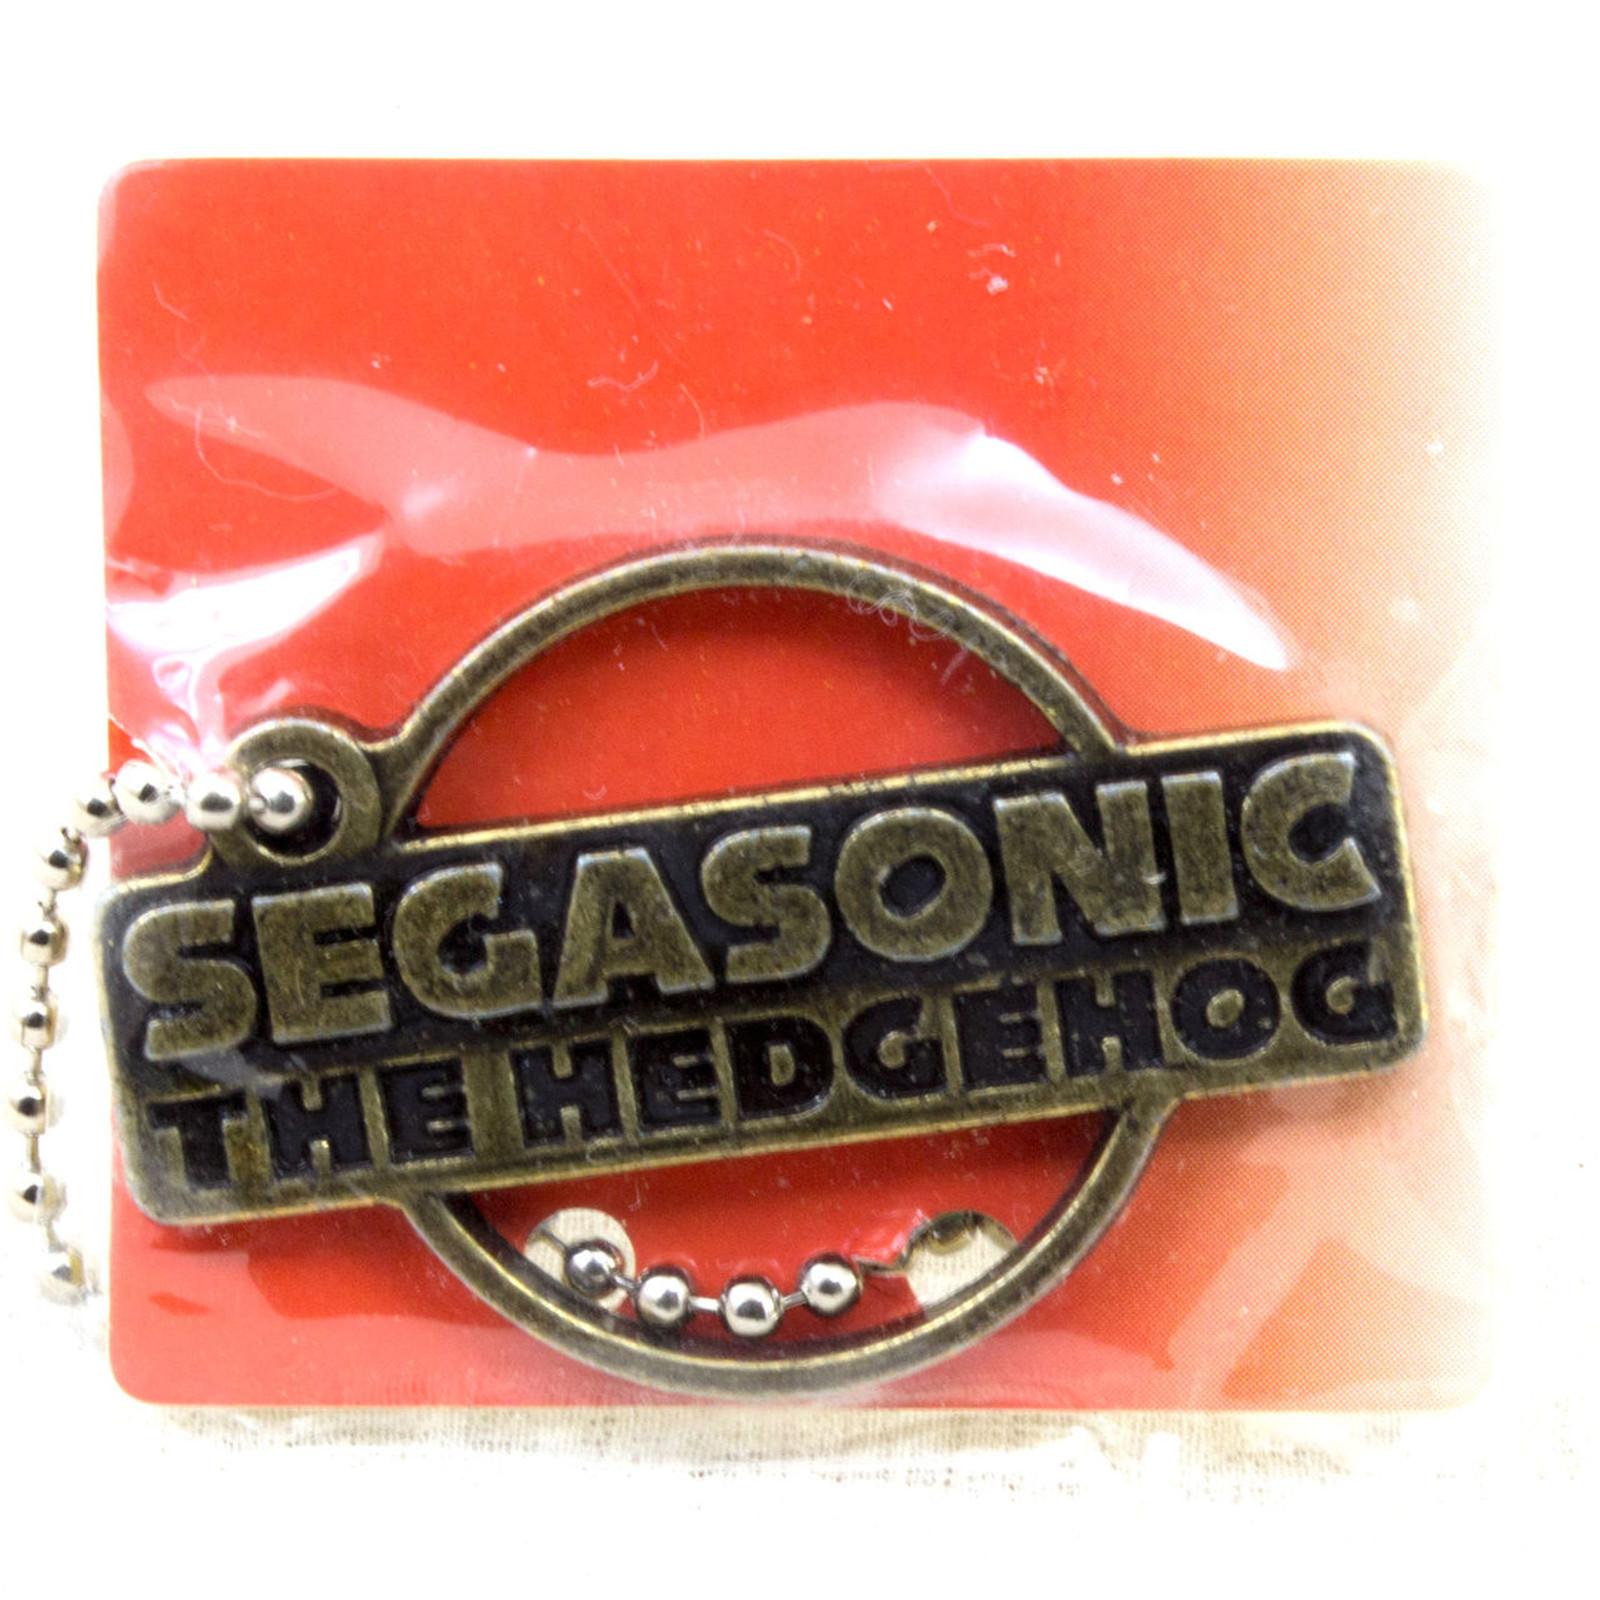 SEGA Logo Metal Plate Ball Chain Sonic The Hedgehog Gold JAPAN GAME